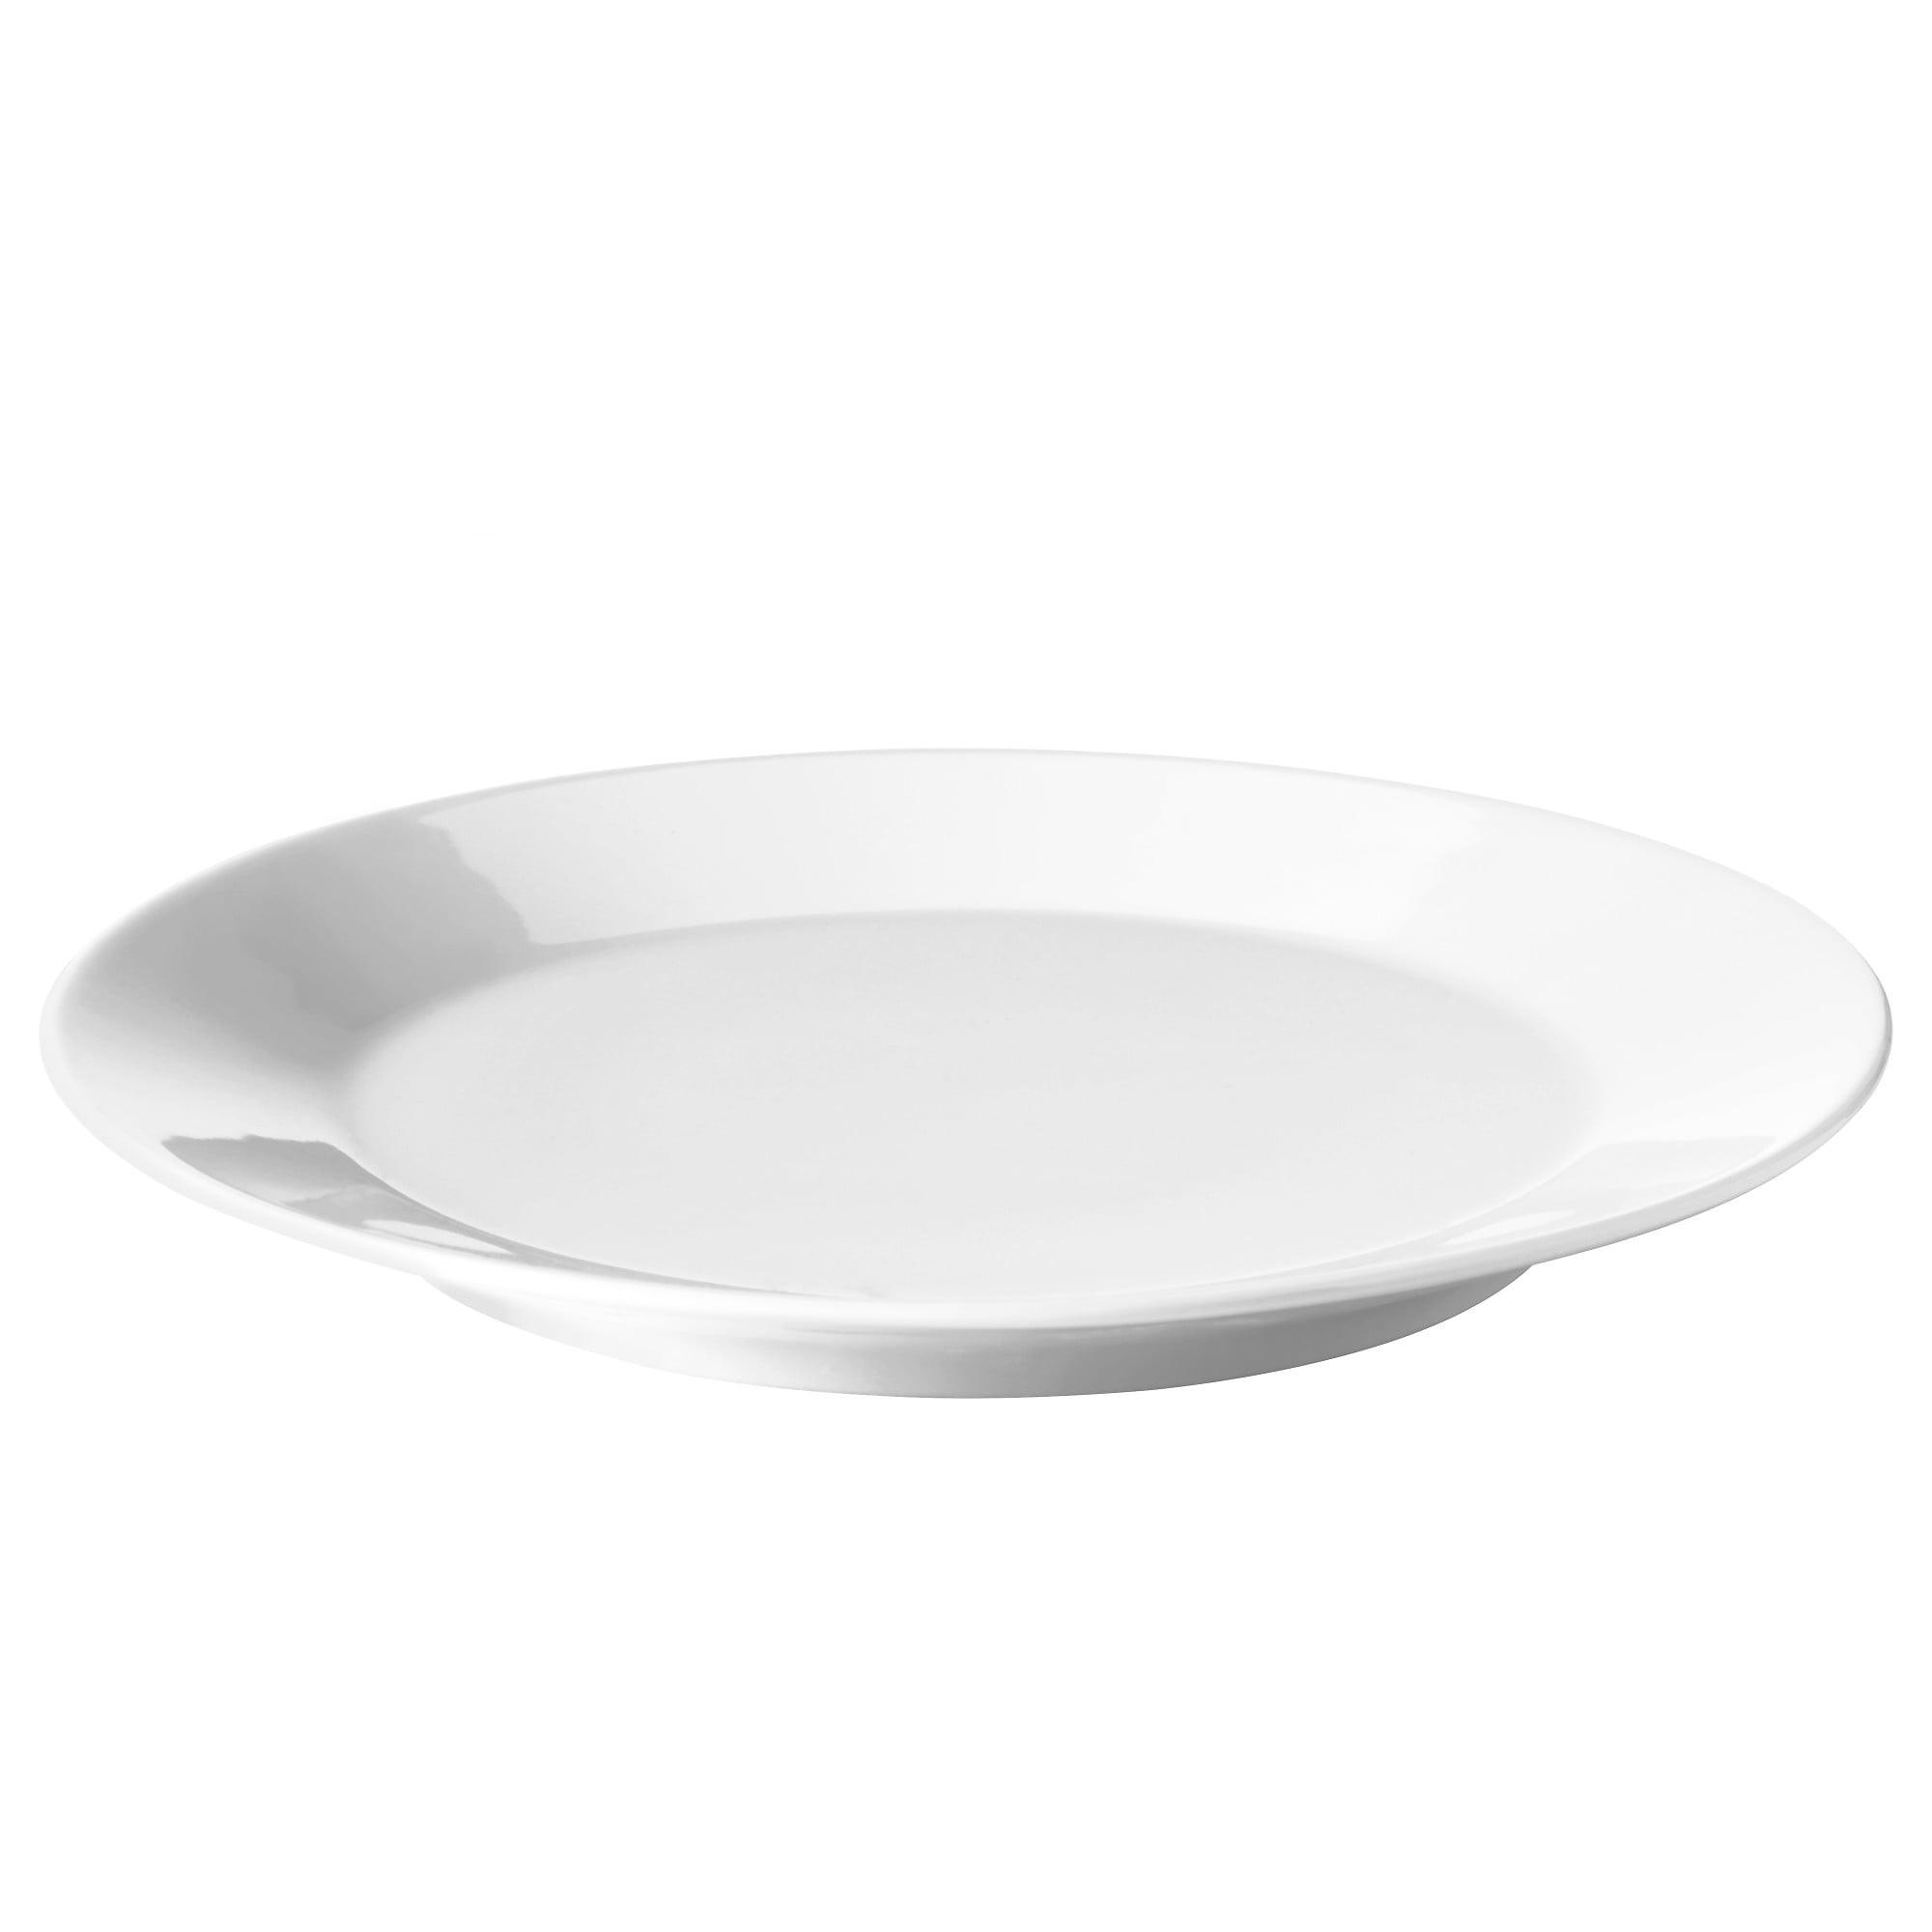 Ikea Dinner Plates  Plates Plate Sets & Dinner Plates